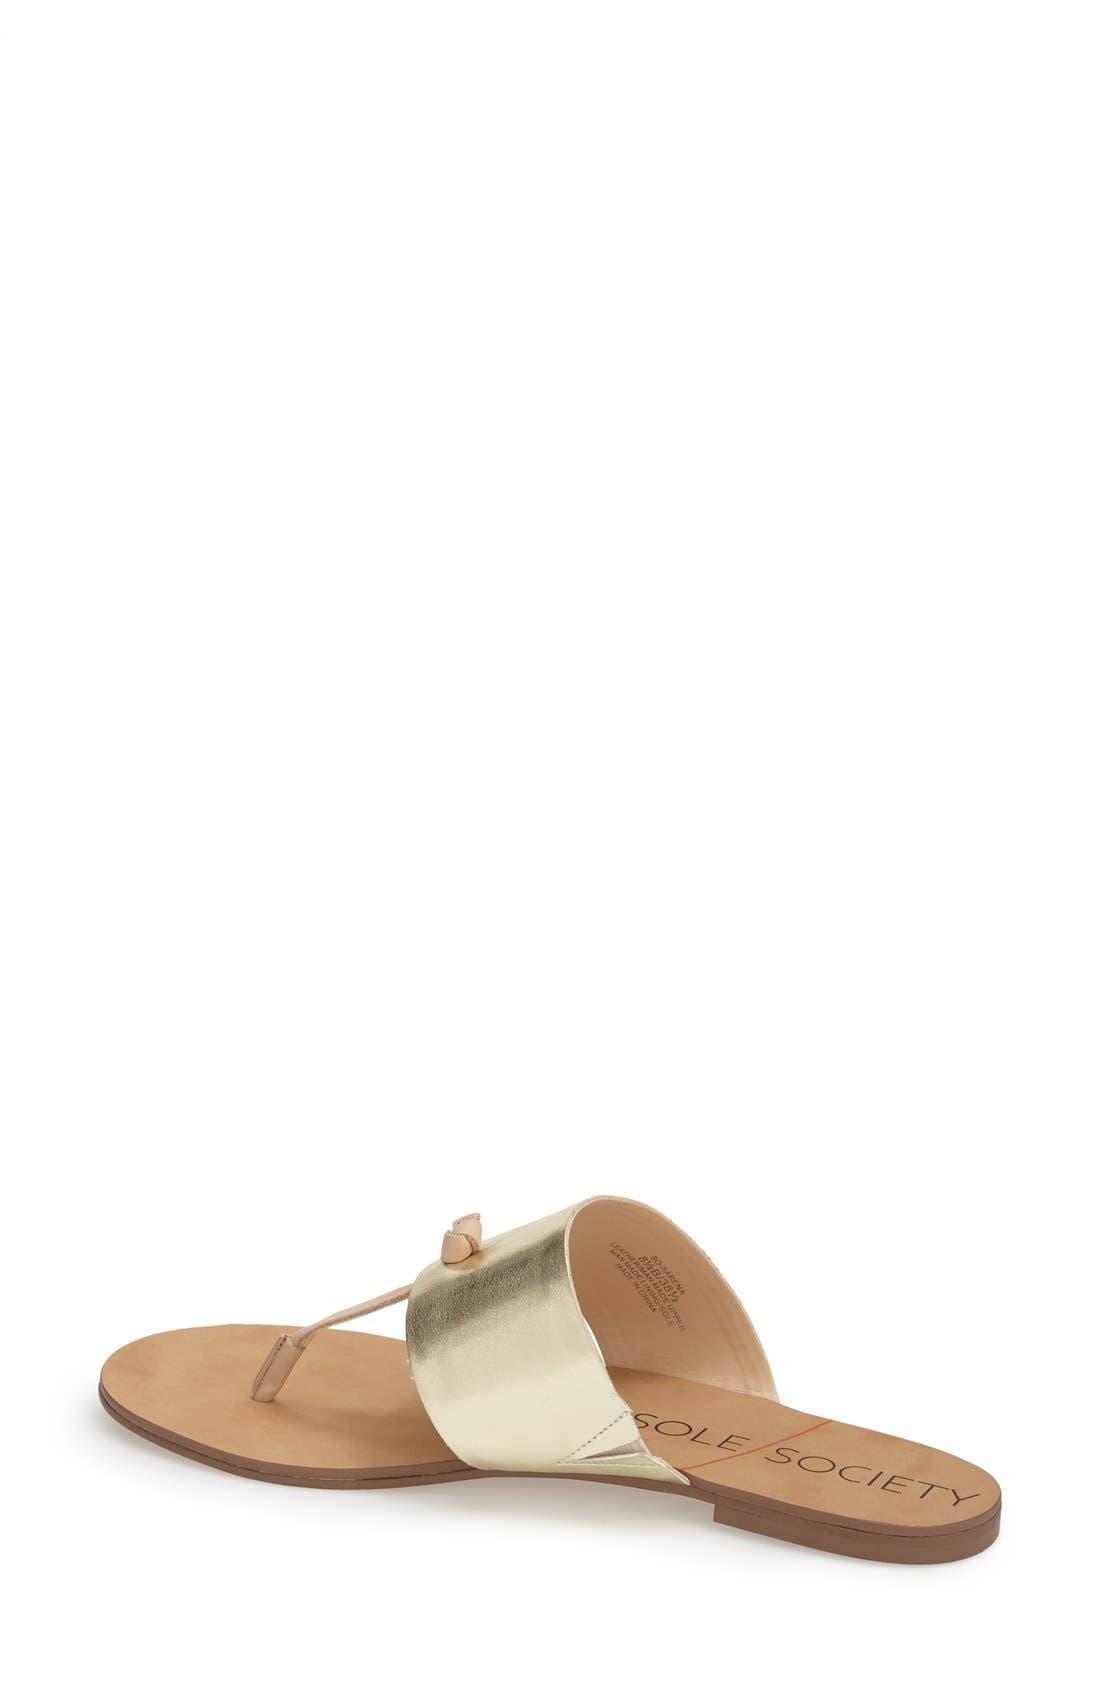 Alternate Image 2  - Sole Society 'Sarena' Thong Sandal (Women)